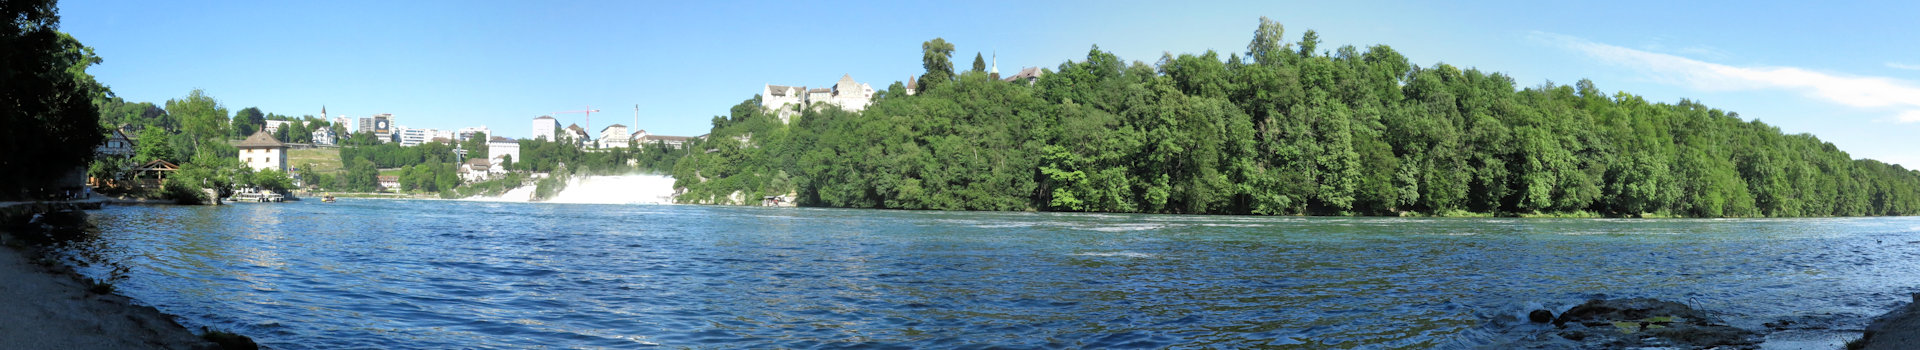 Von Rheinau zum Rheinfall